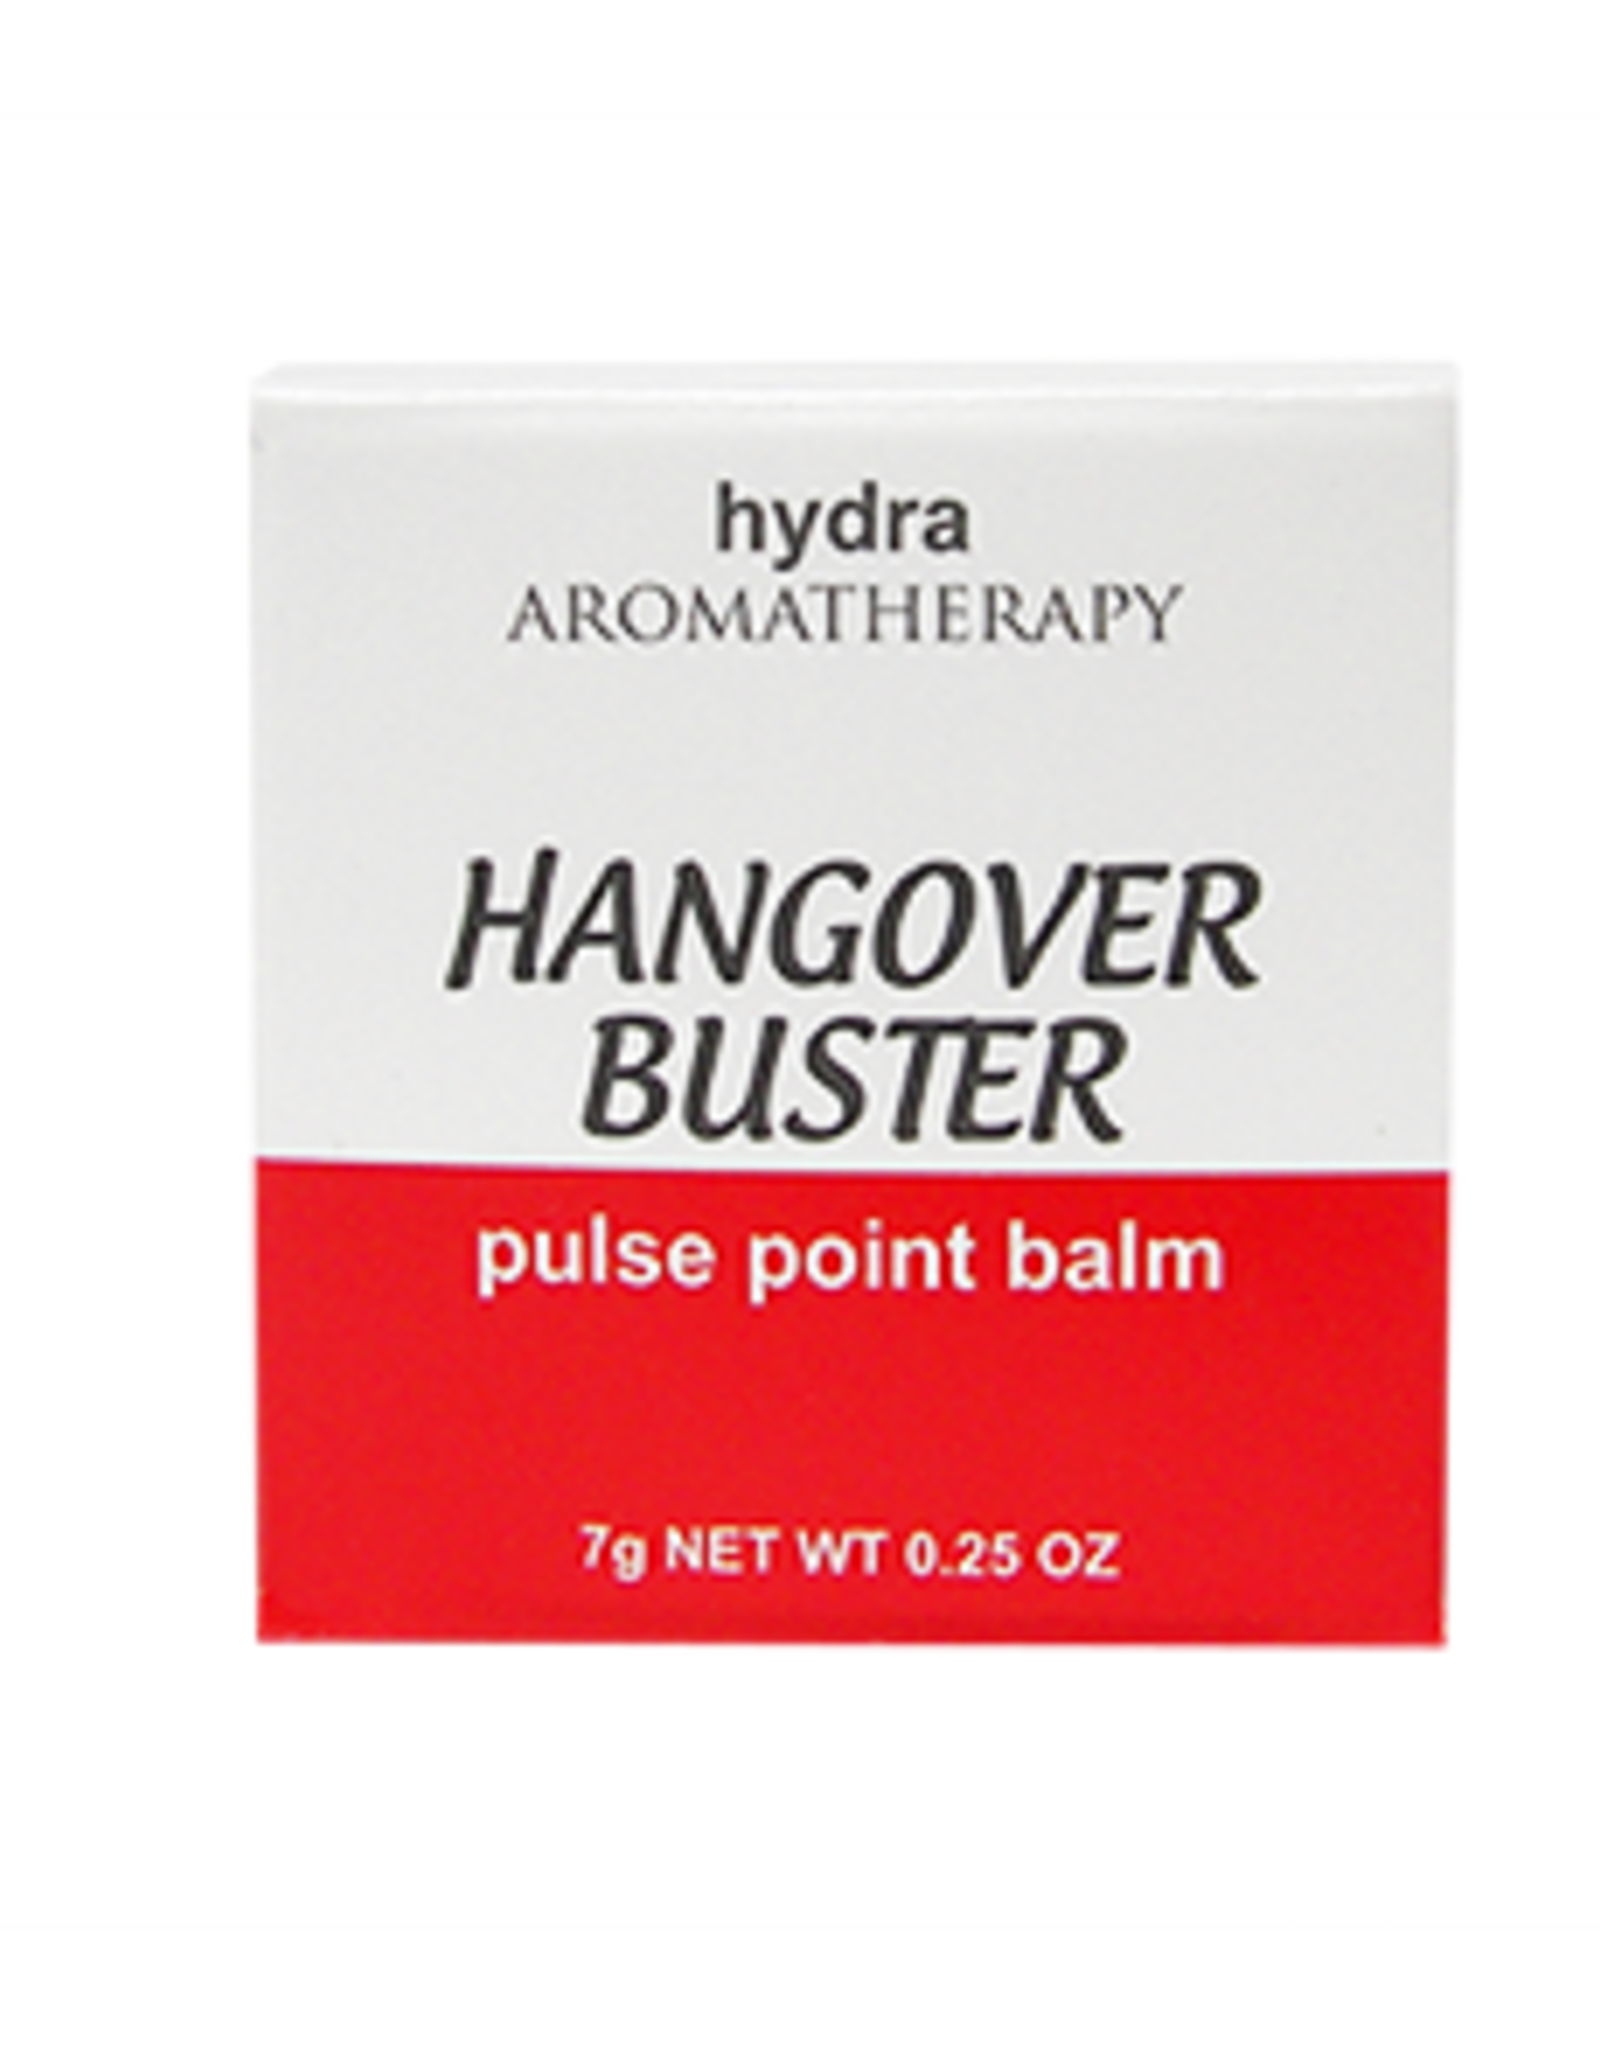 Hydra HydraAromatherapy | Pulse Point Balm